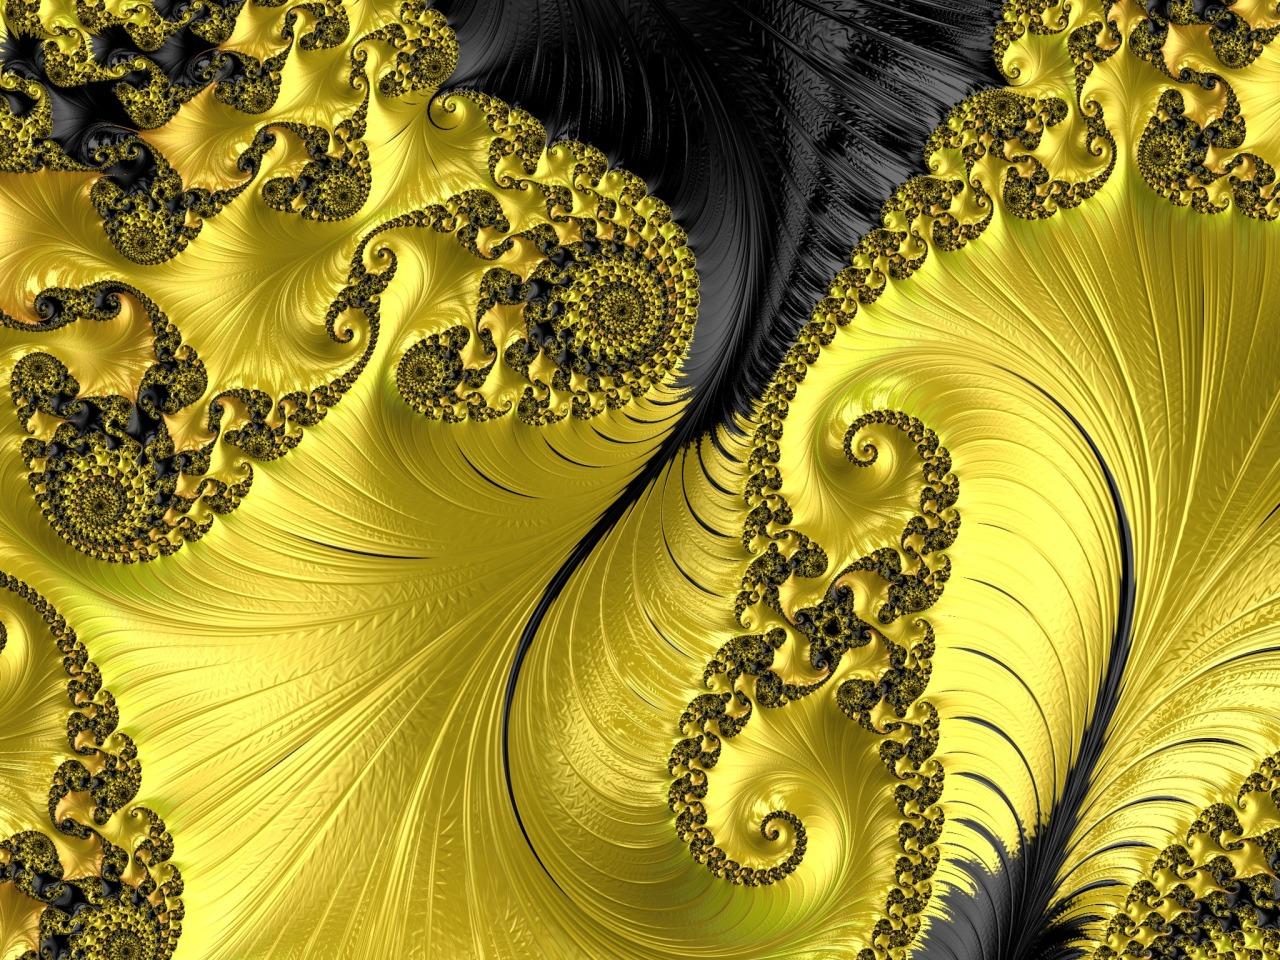 Yellow 20140714 - 1280px x 960px